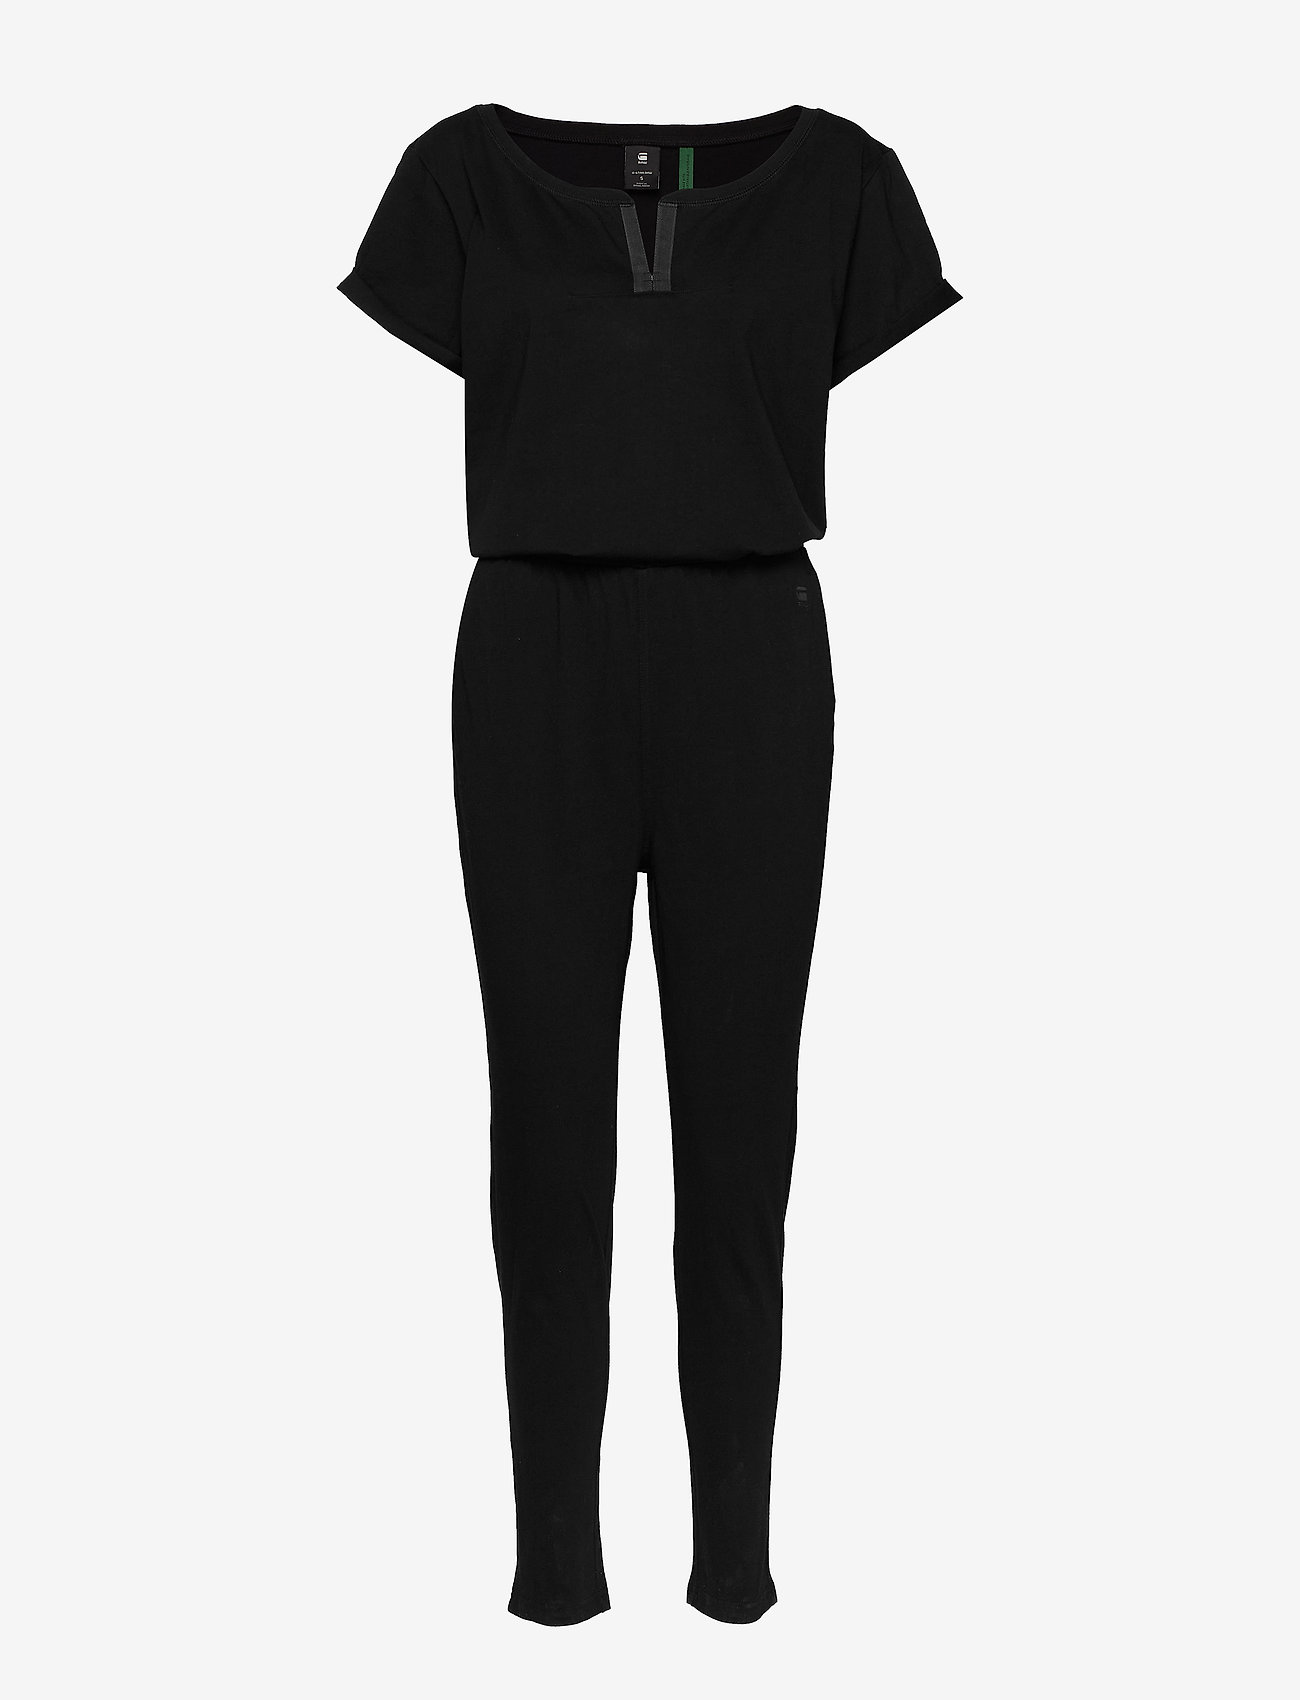 G-star RAW - Cocaux r suit wmn s\s - buksedragter - dk black - 0